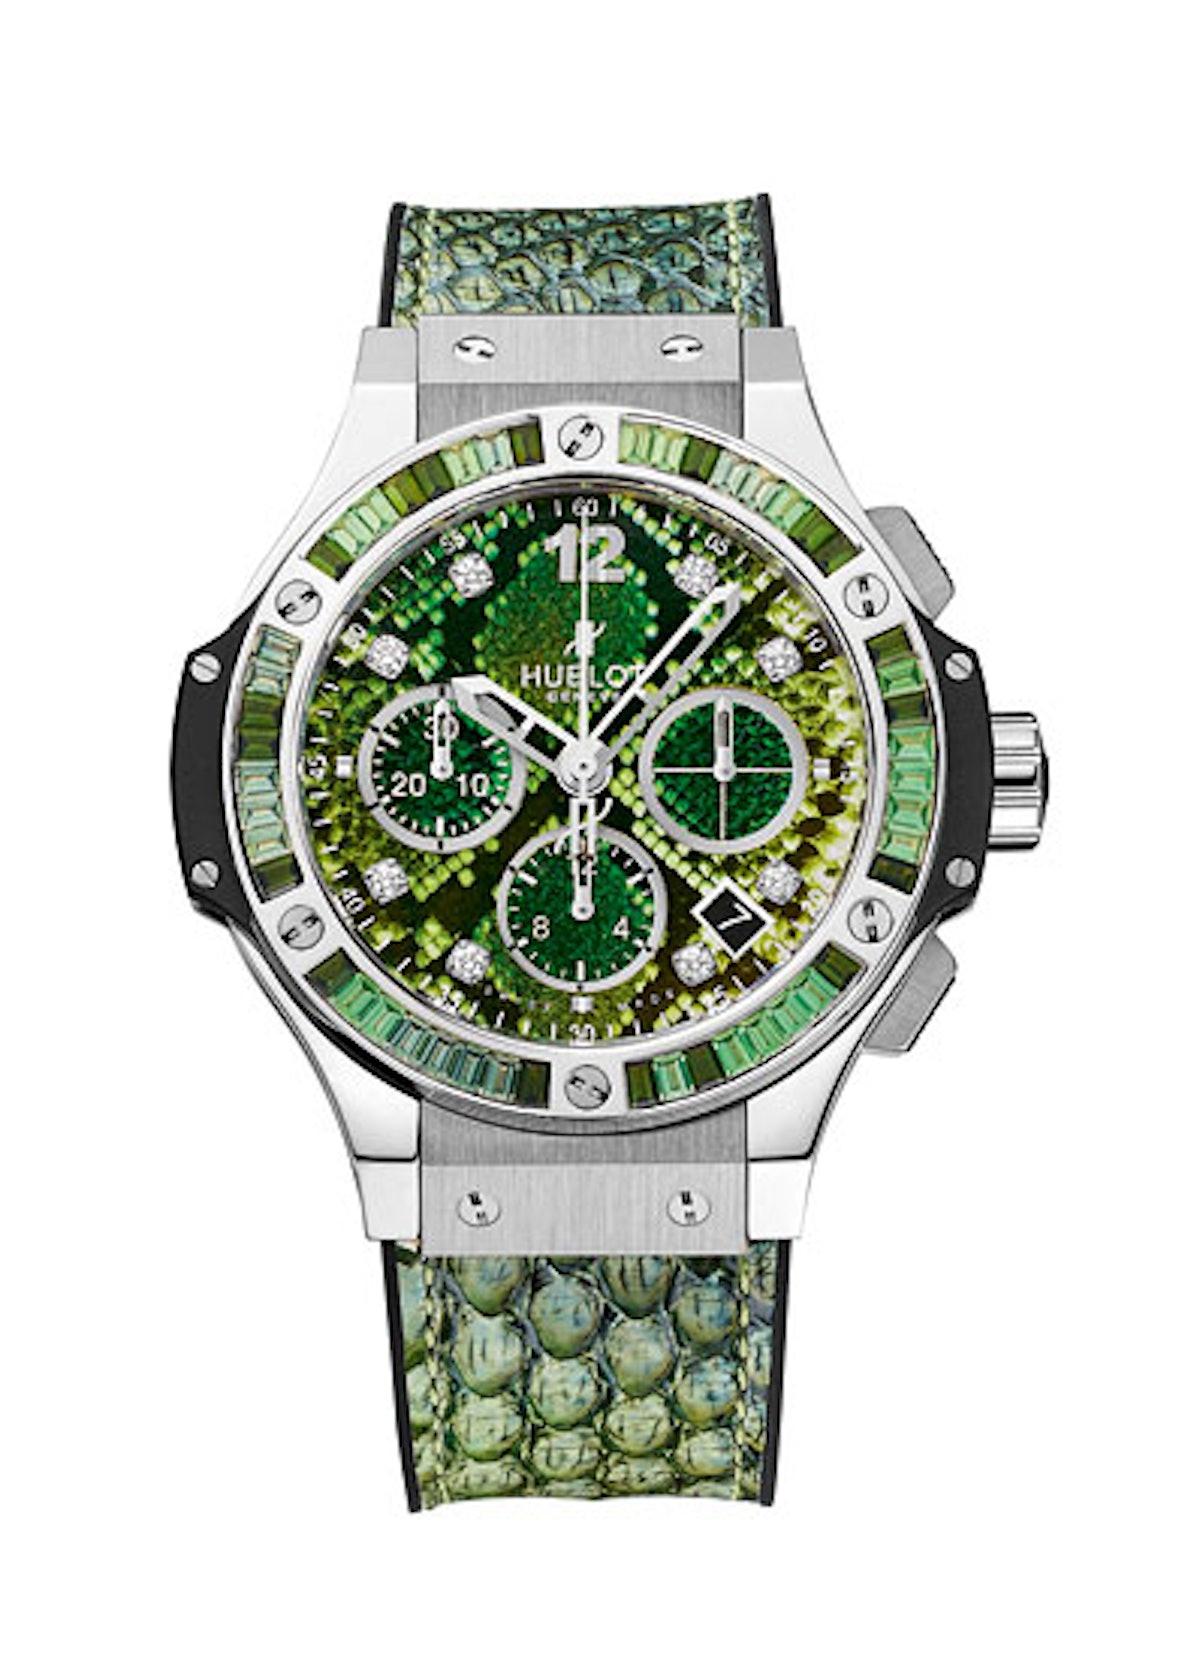 acss-basel-watches-roundup-11-v.jpg